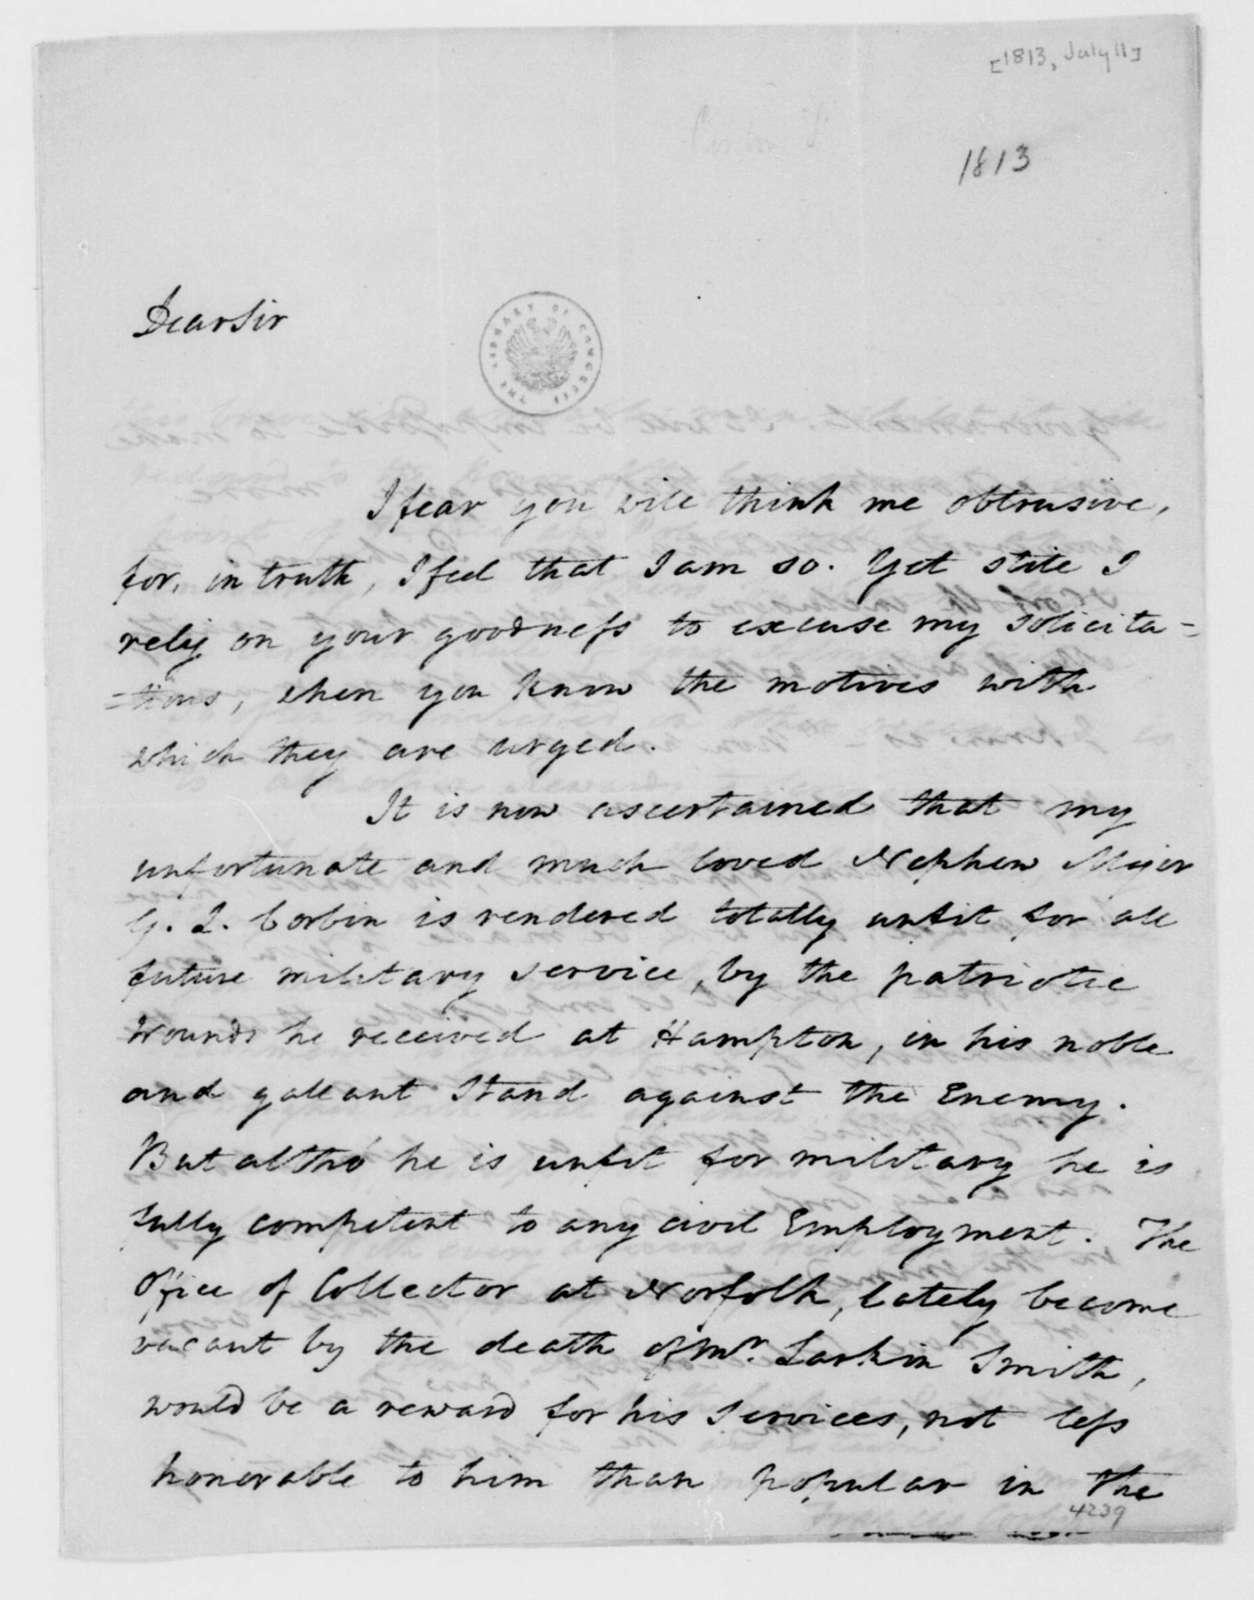 Francis Corbin to James Madison, July 11, 1813.